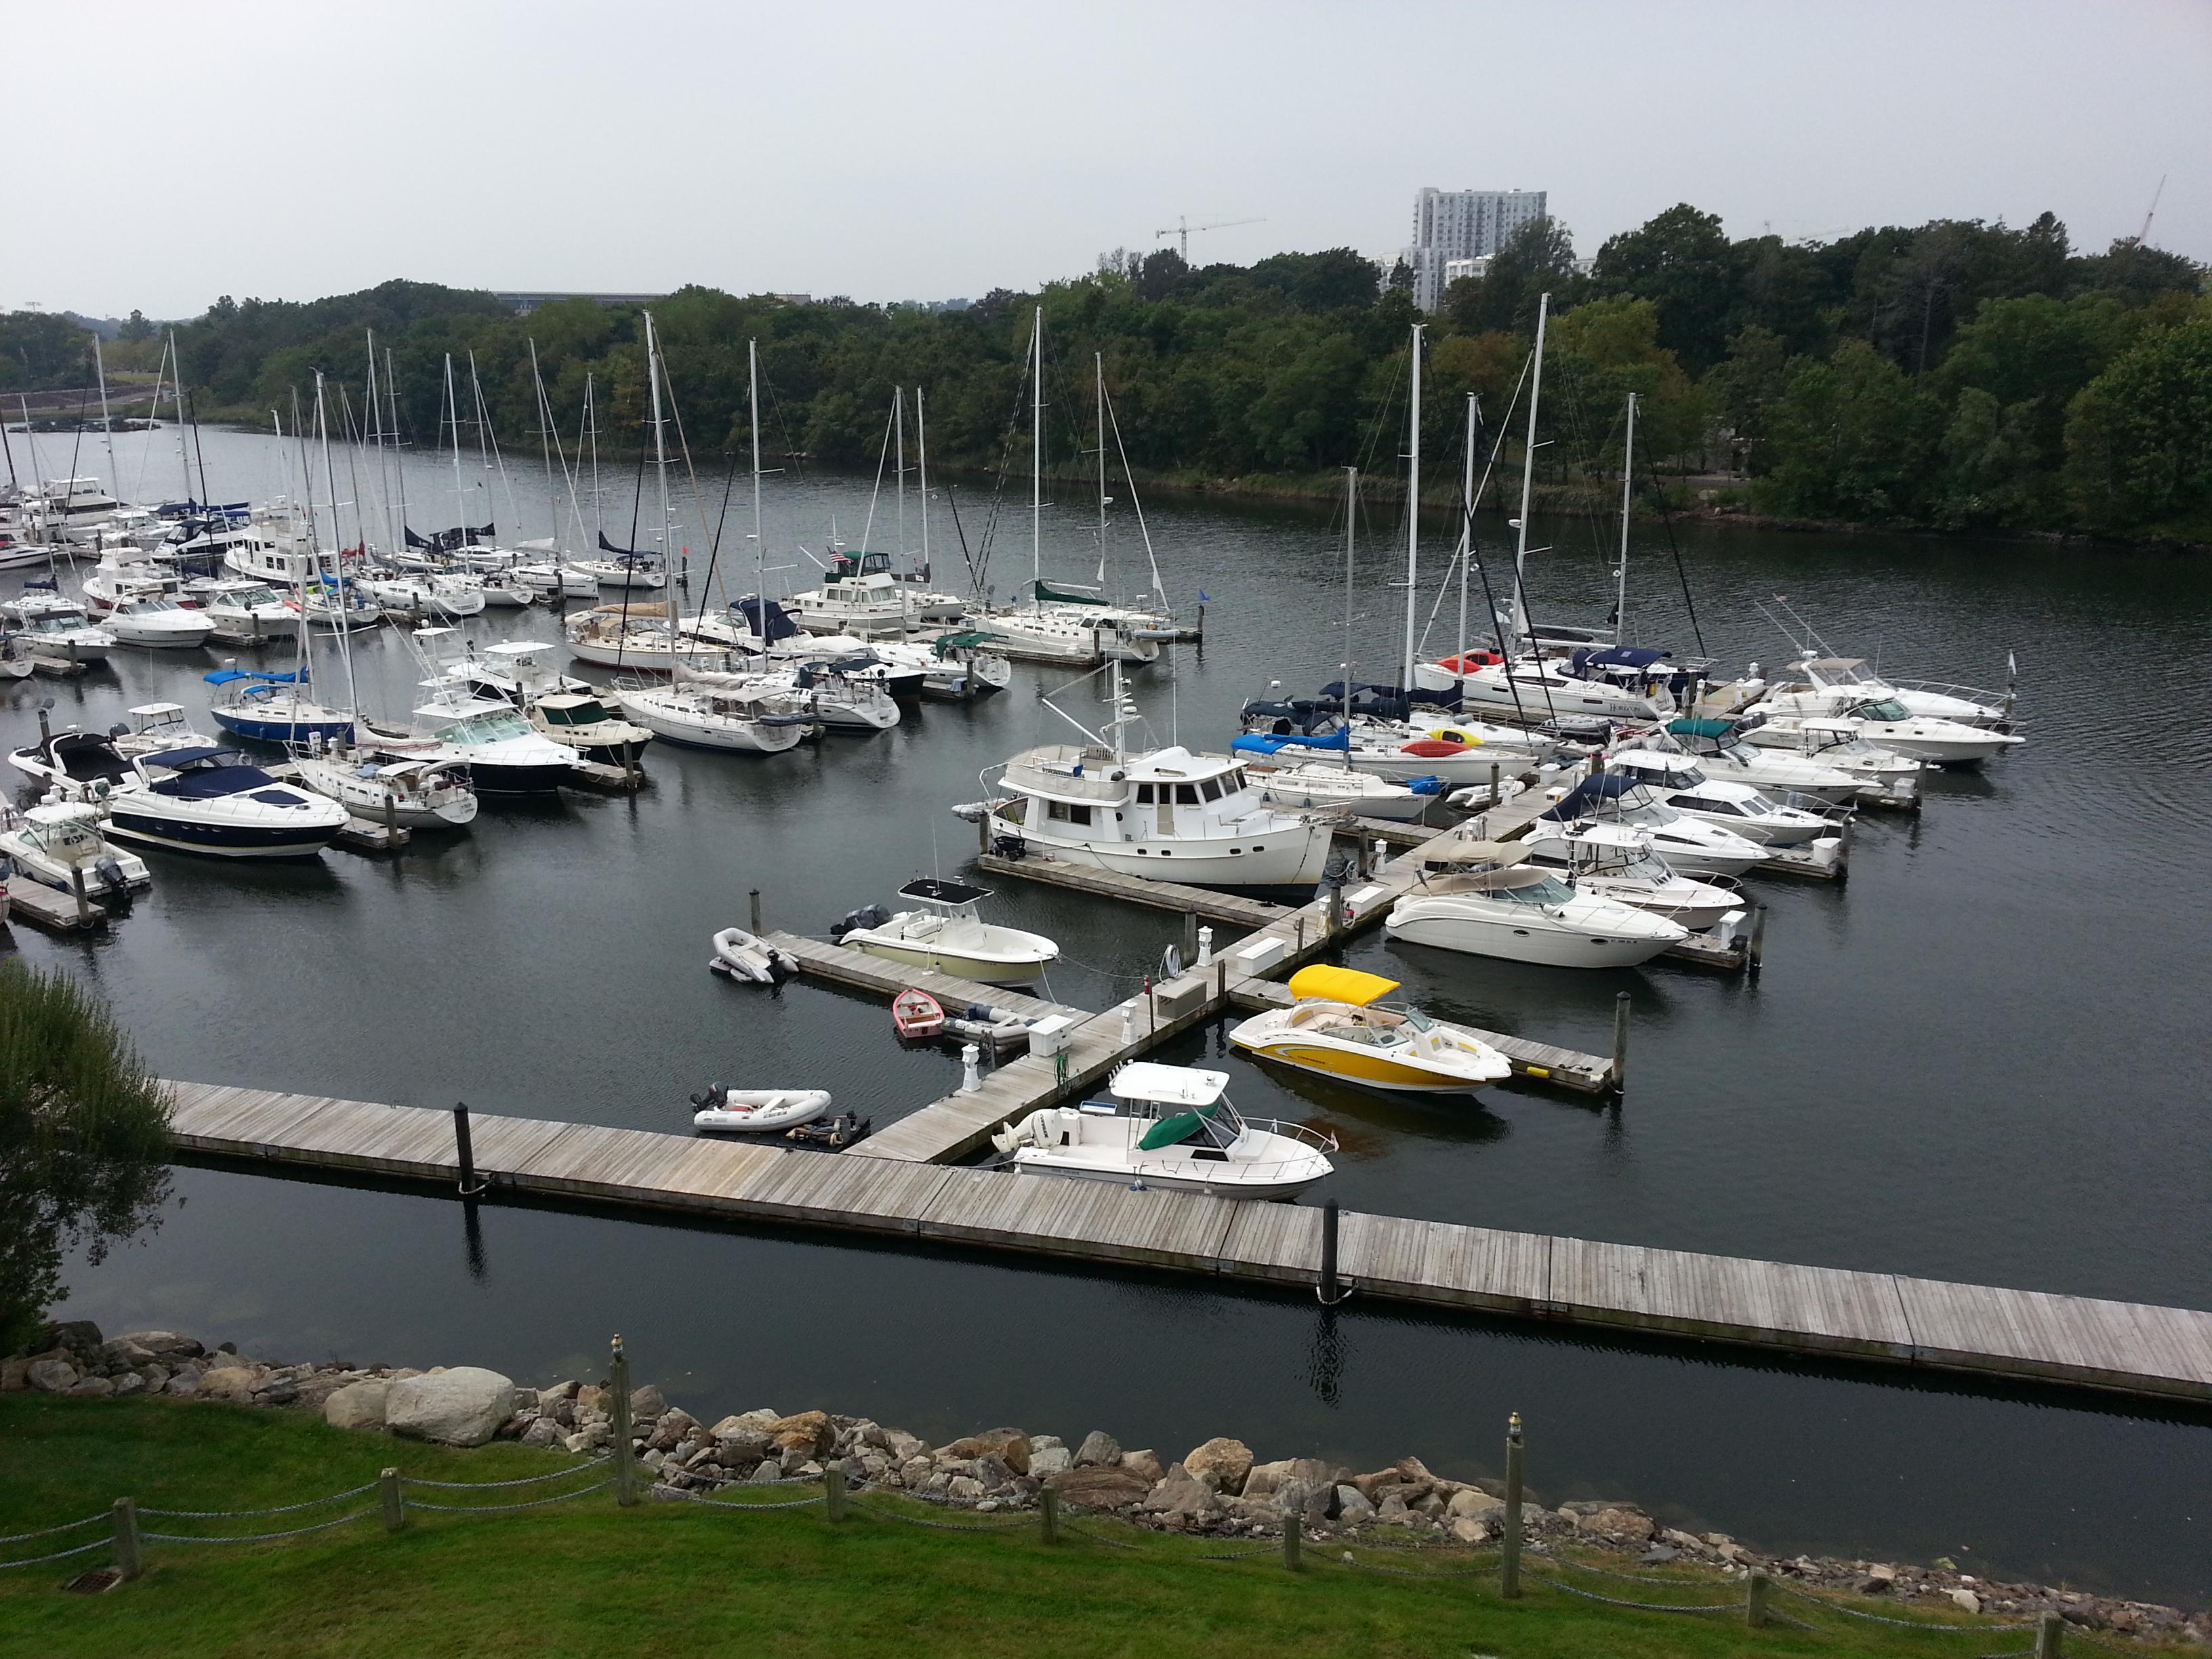 Harbor House Marina in Stamford, CT